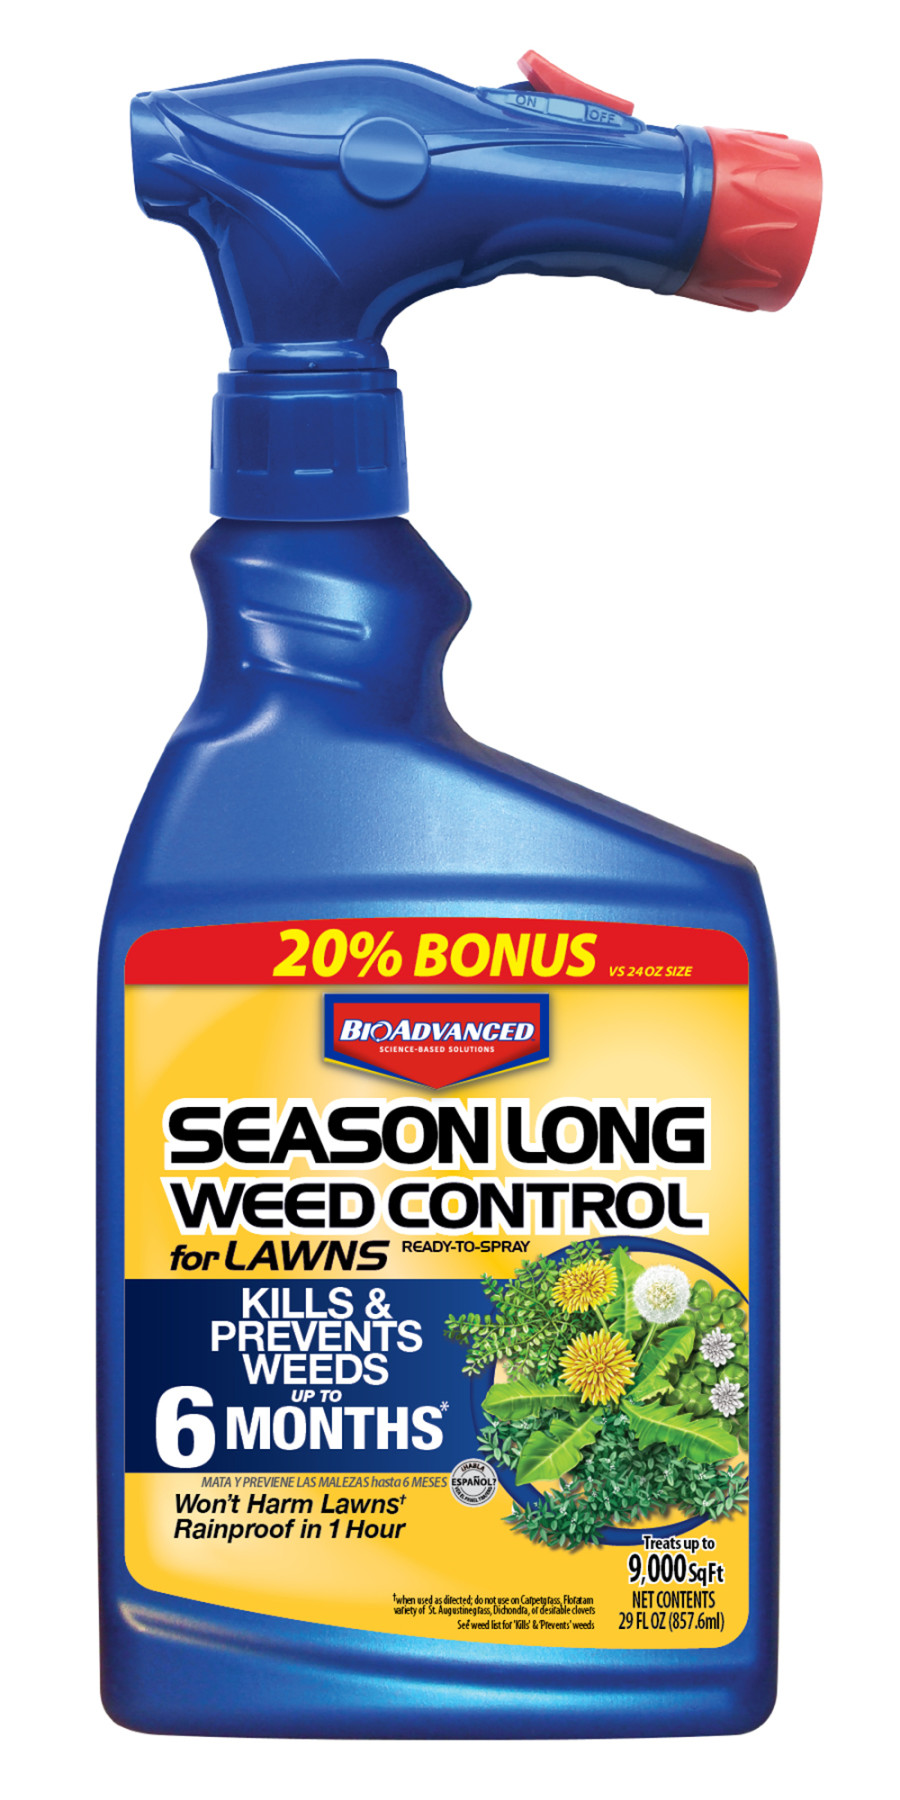 BioAdvanced Season Long Weed Control for Lawns Ready to Spray 8ea/29 oz